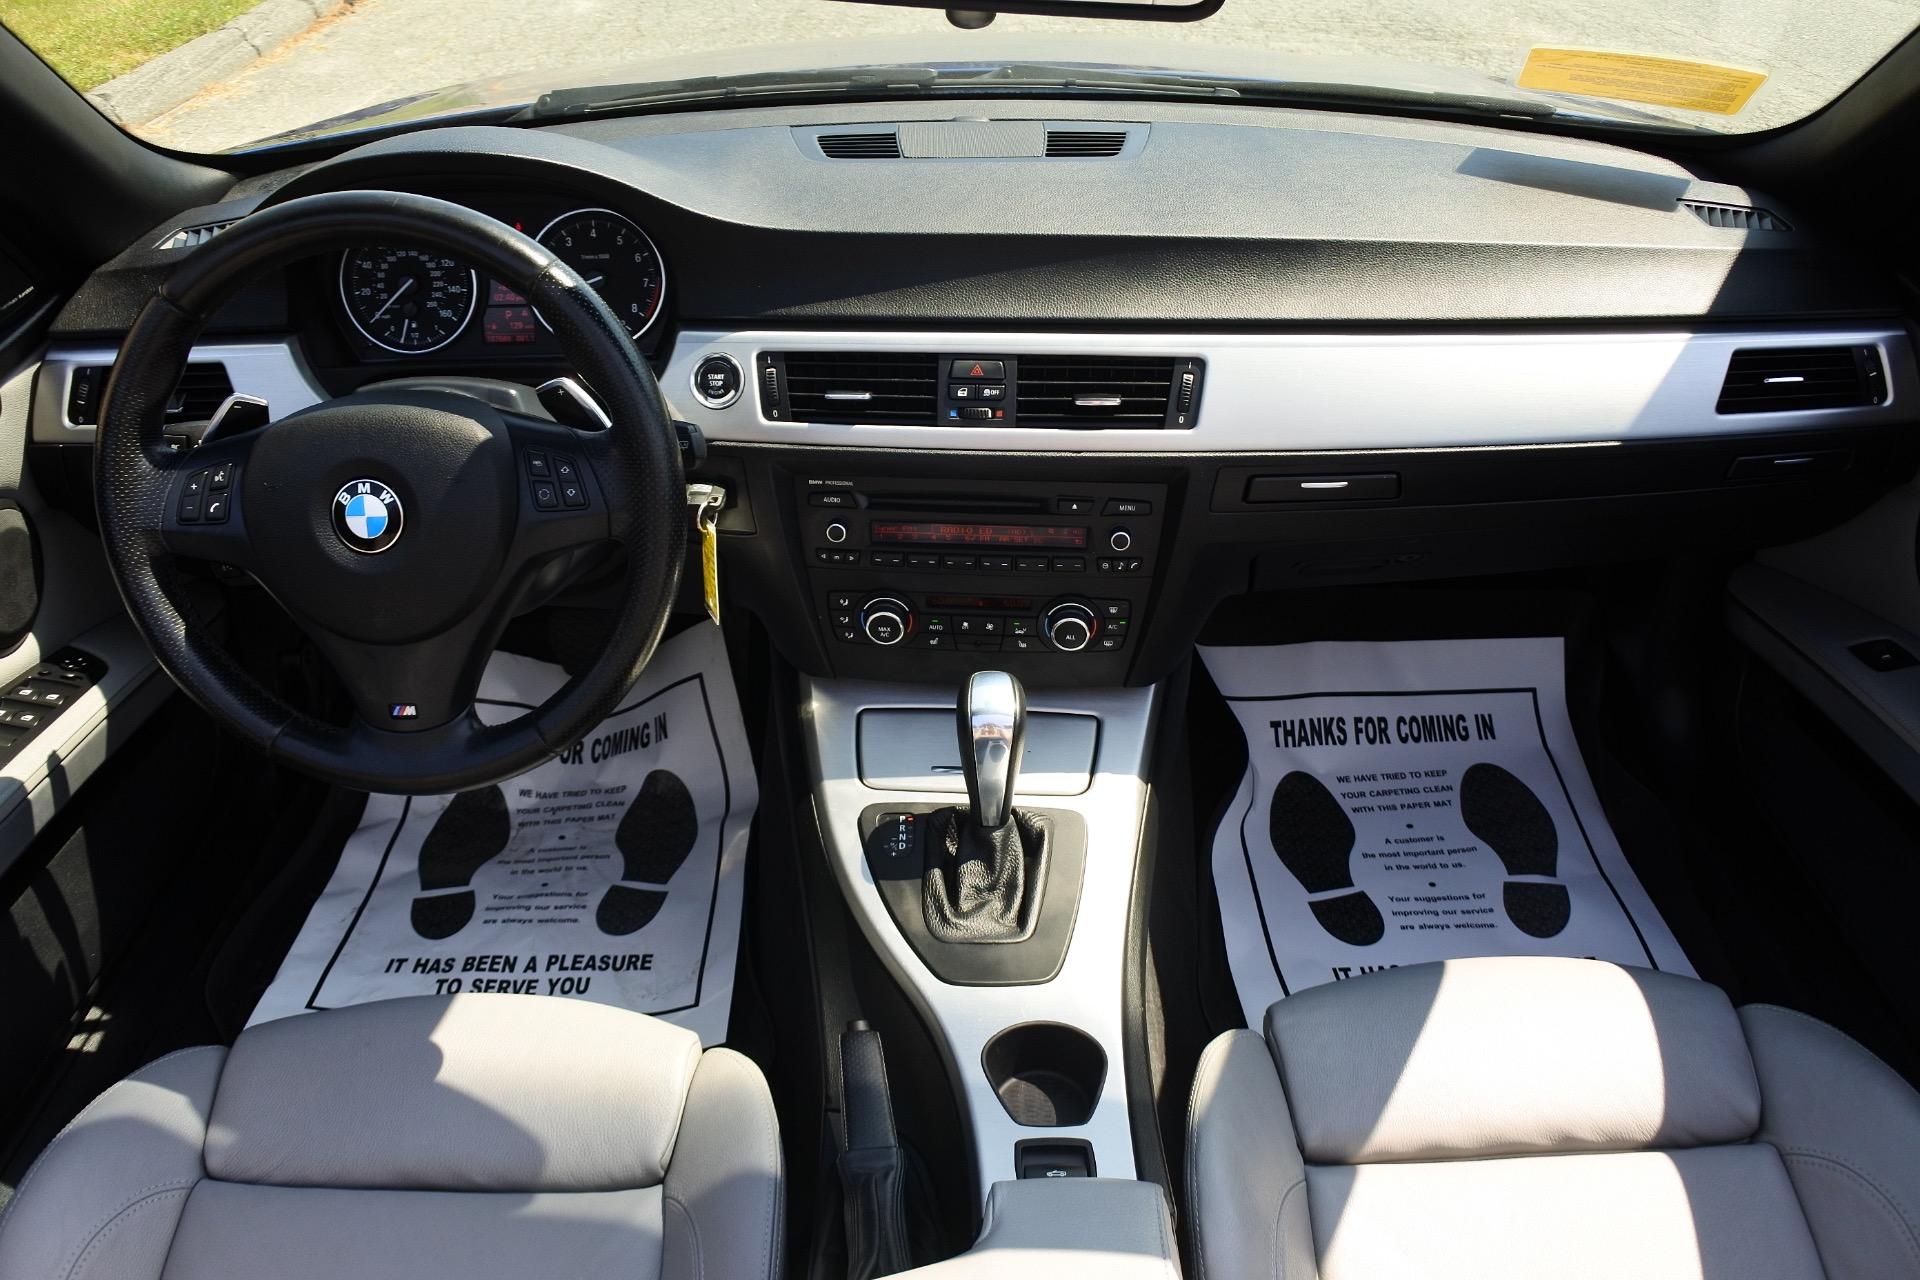 Used 2013 BMW 3 Series 2dr Conv 335i Used 2013 BMW 3 Series 2dr Conv 335i for sale  at Metro West Motorcars LLC in Shrewsbury MA 9